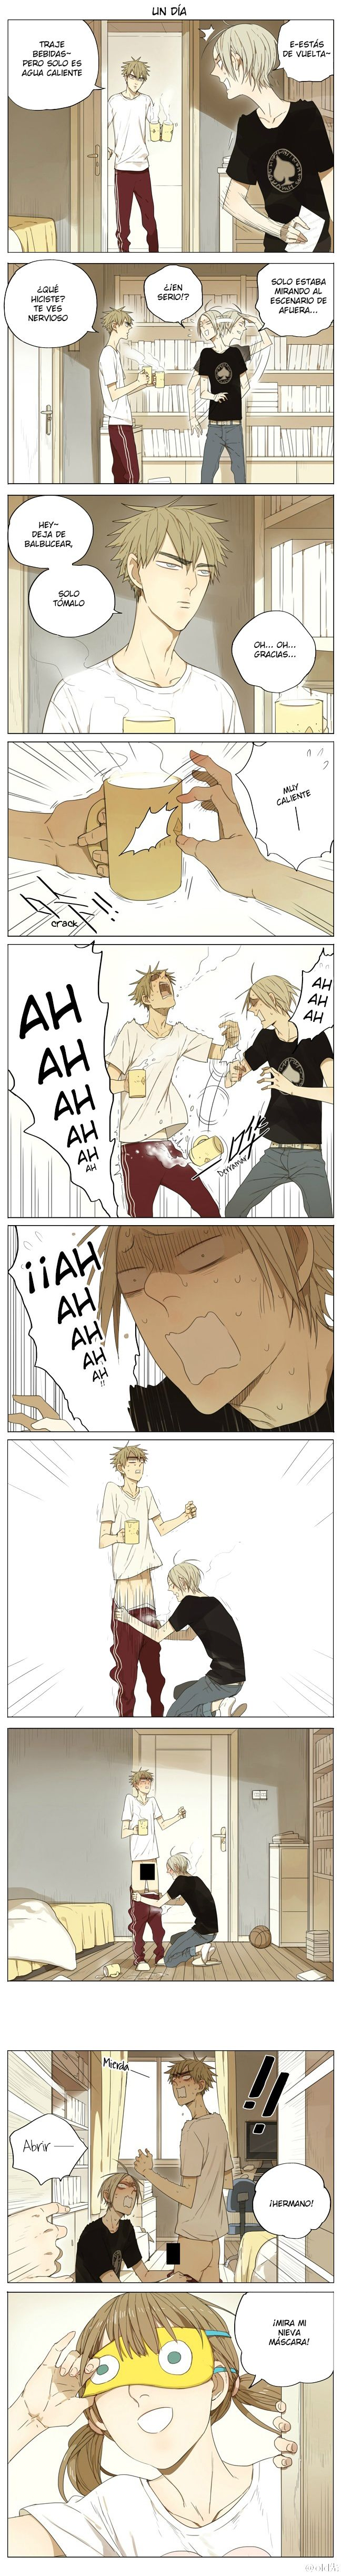 19 Days Capítulo 4 página 3 (Cargar imágenes: 6) - Leer Manga en Español gratis en NineManga.com